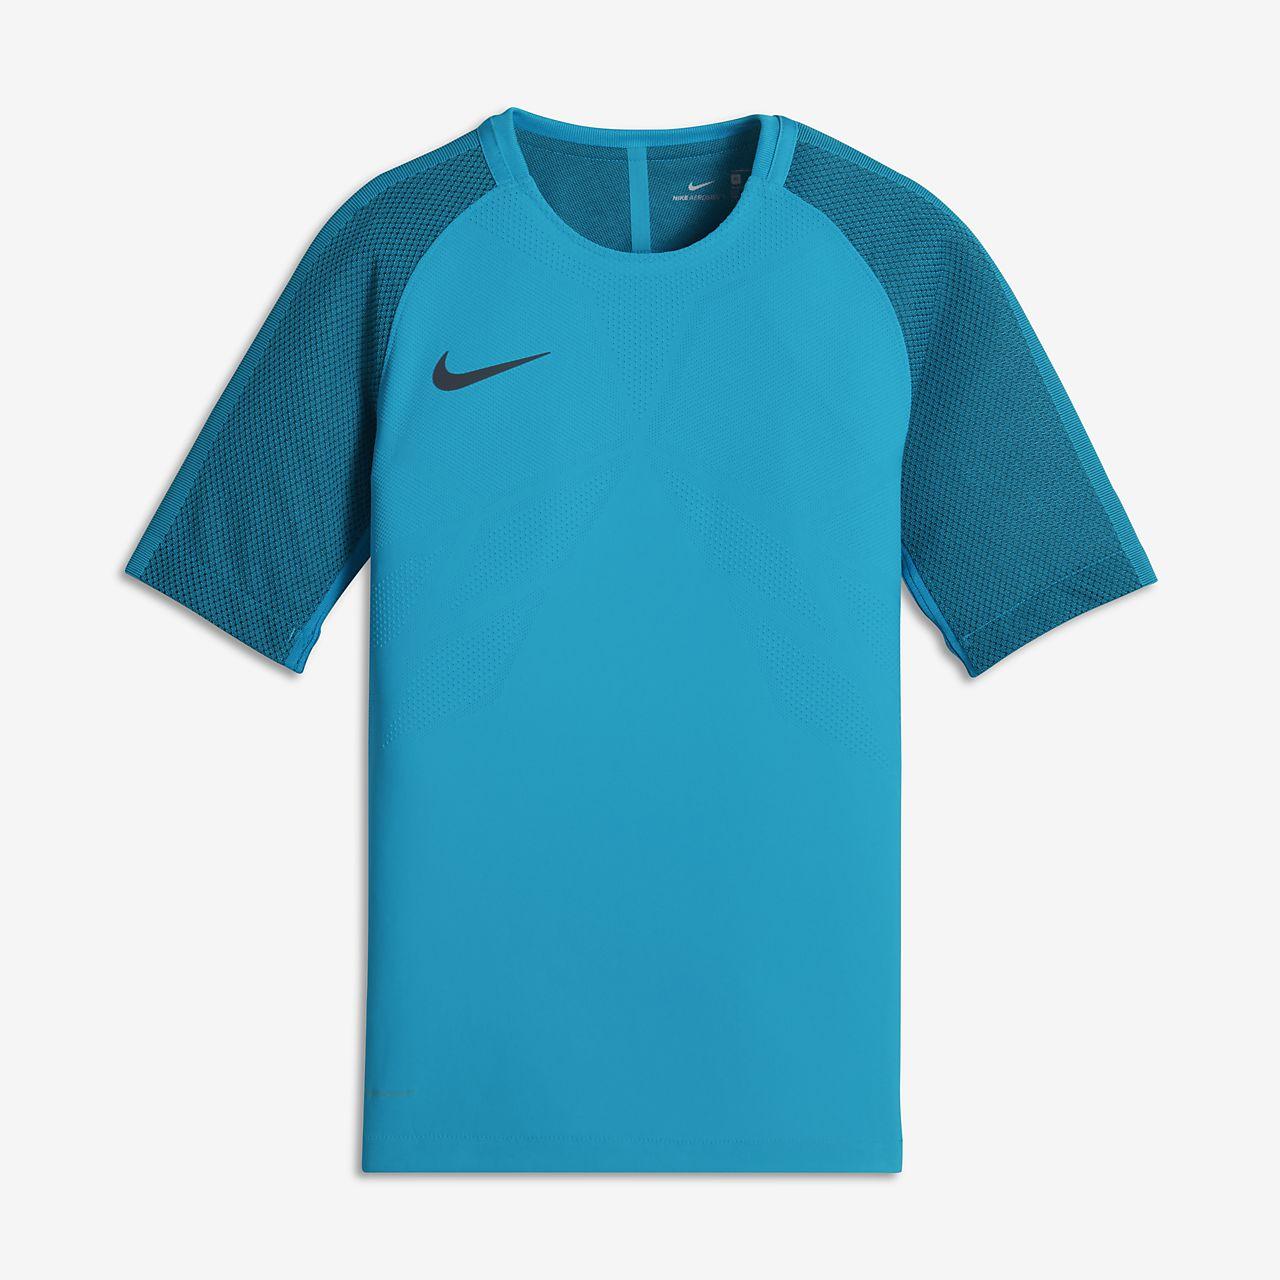 6e5f99cc06 Nike AeroSwift Strike Older Kids  (Boys ) Short-Sleeve Football Top ...